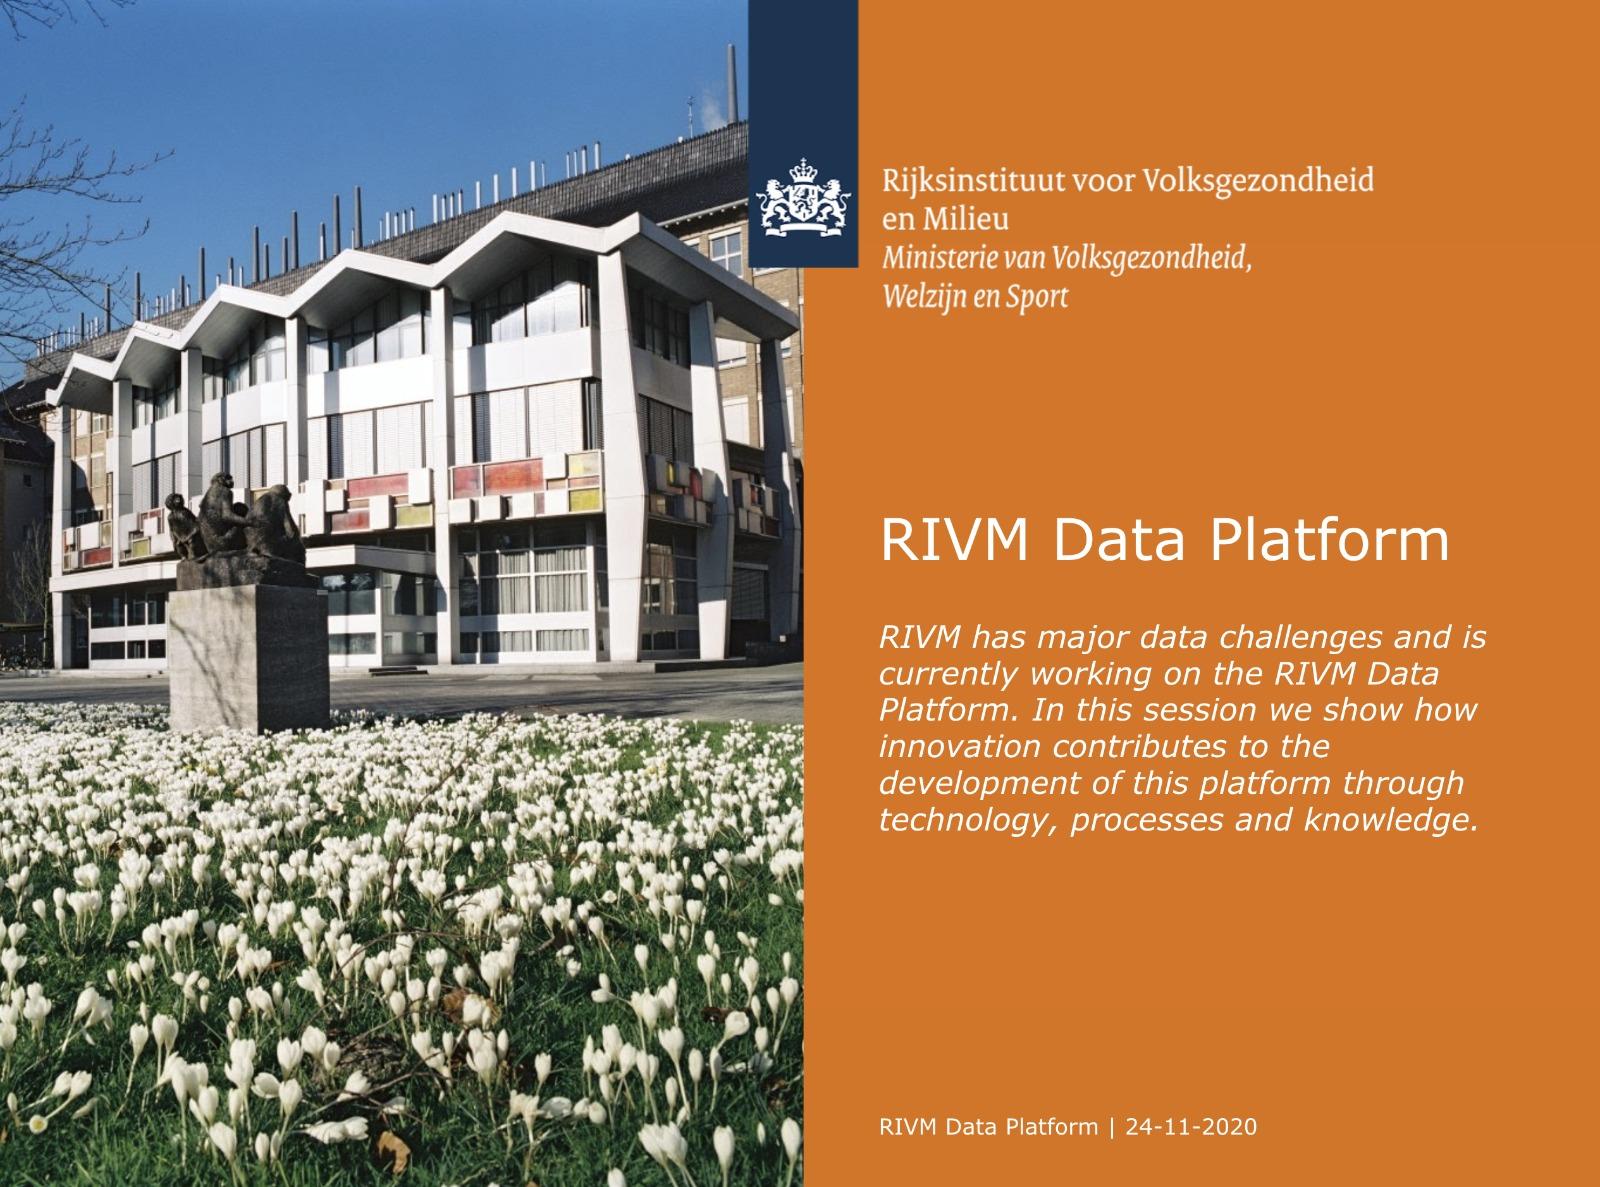 RIVM Data Platform